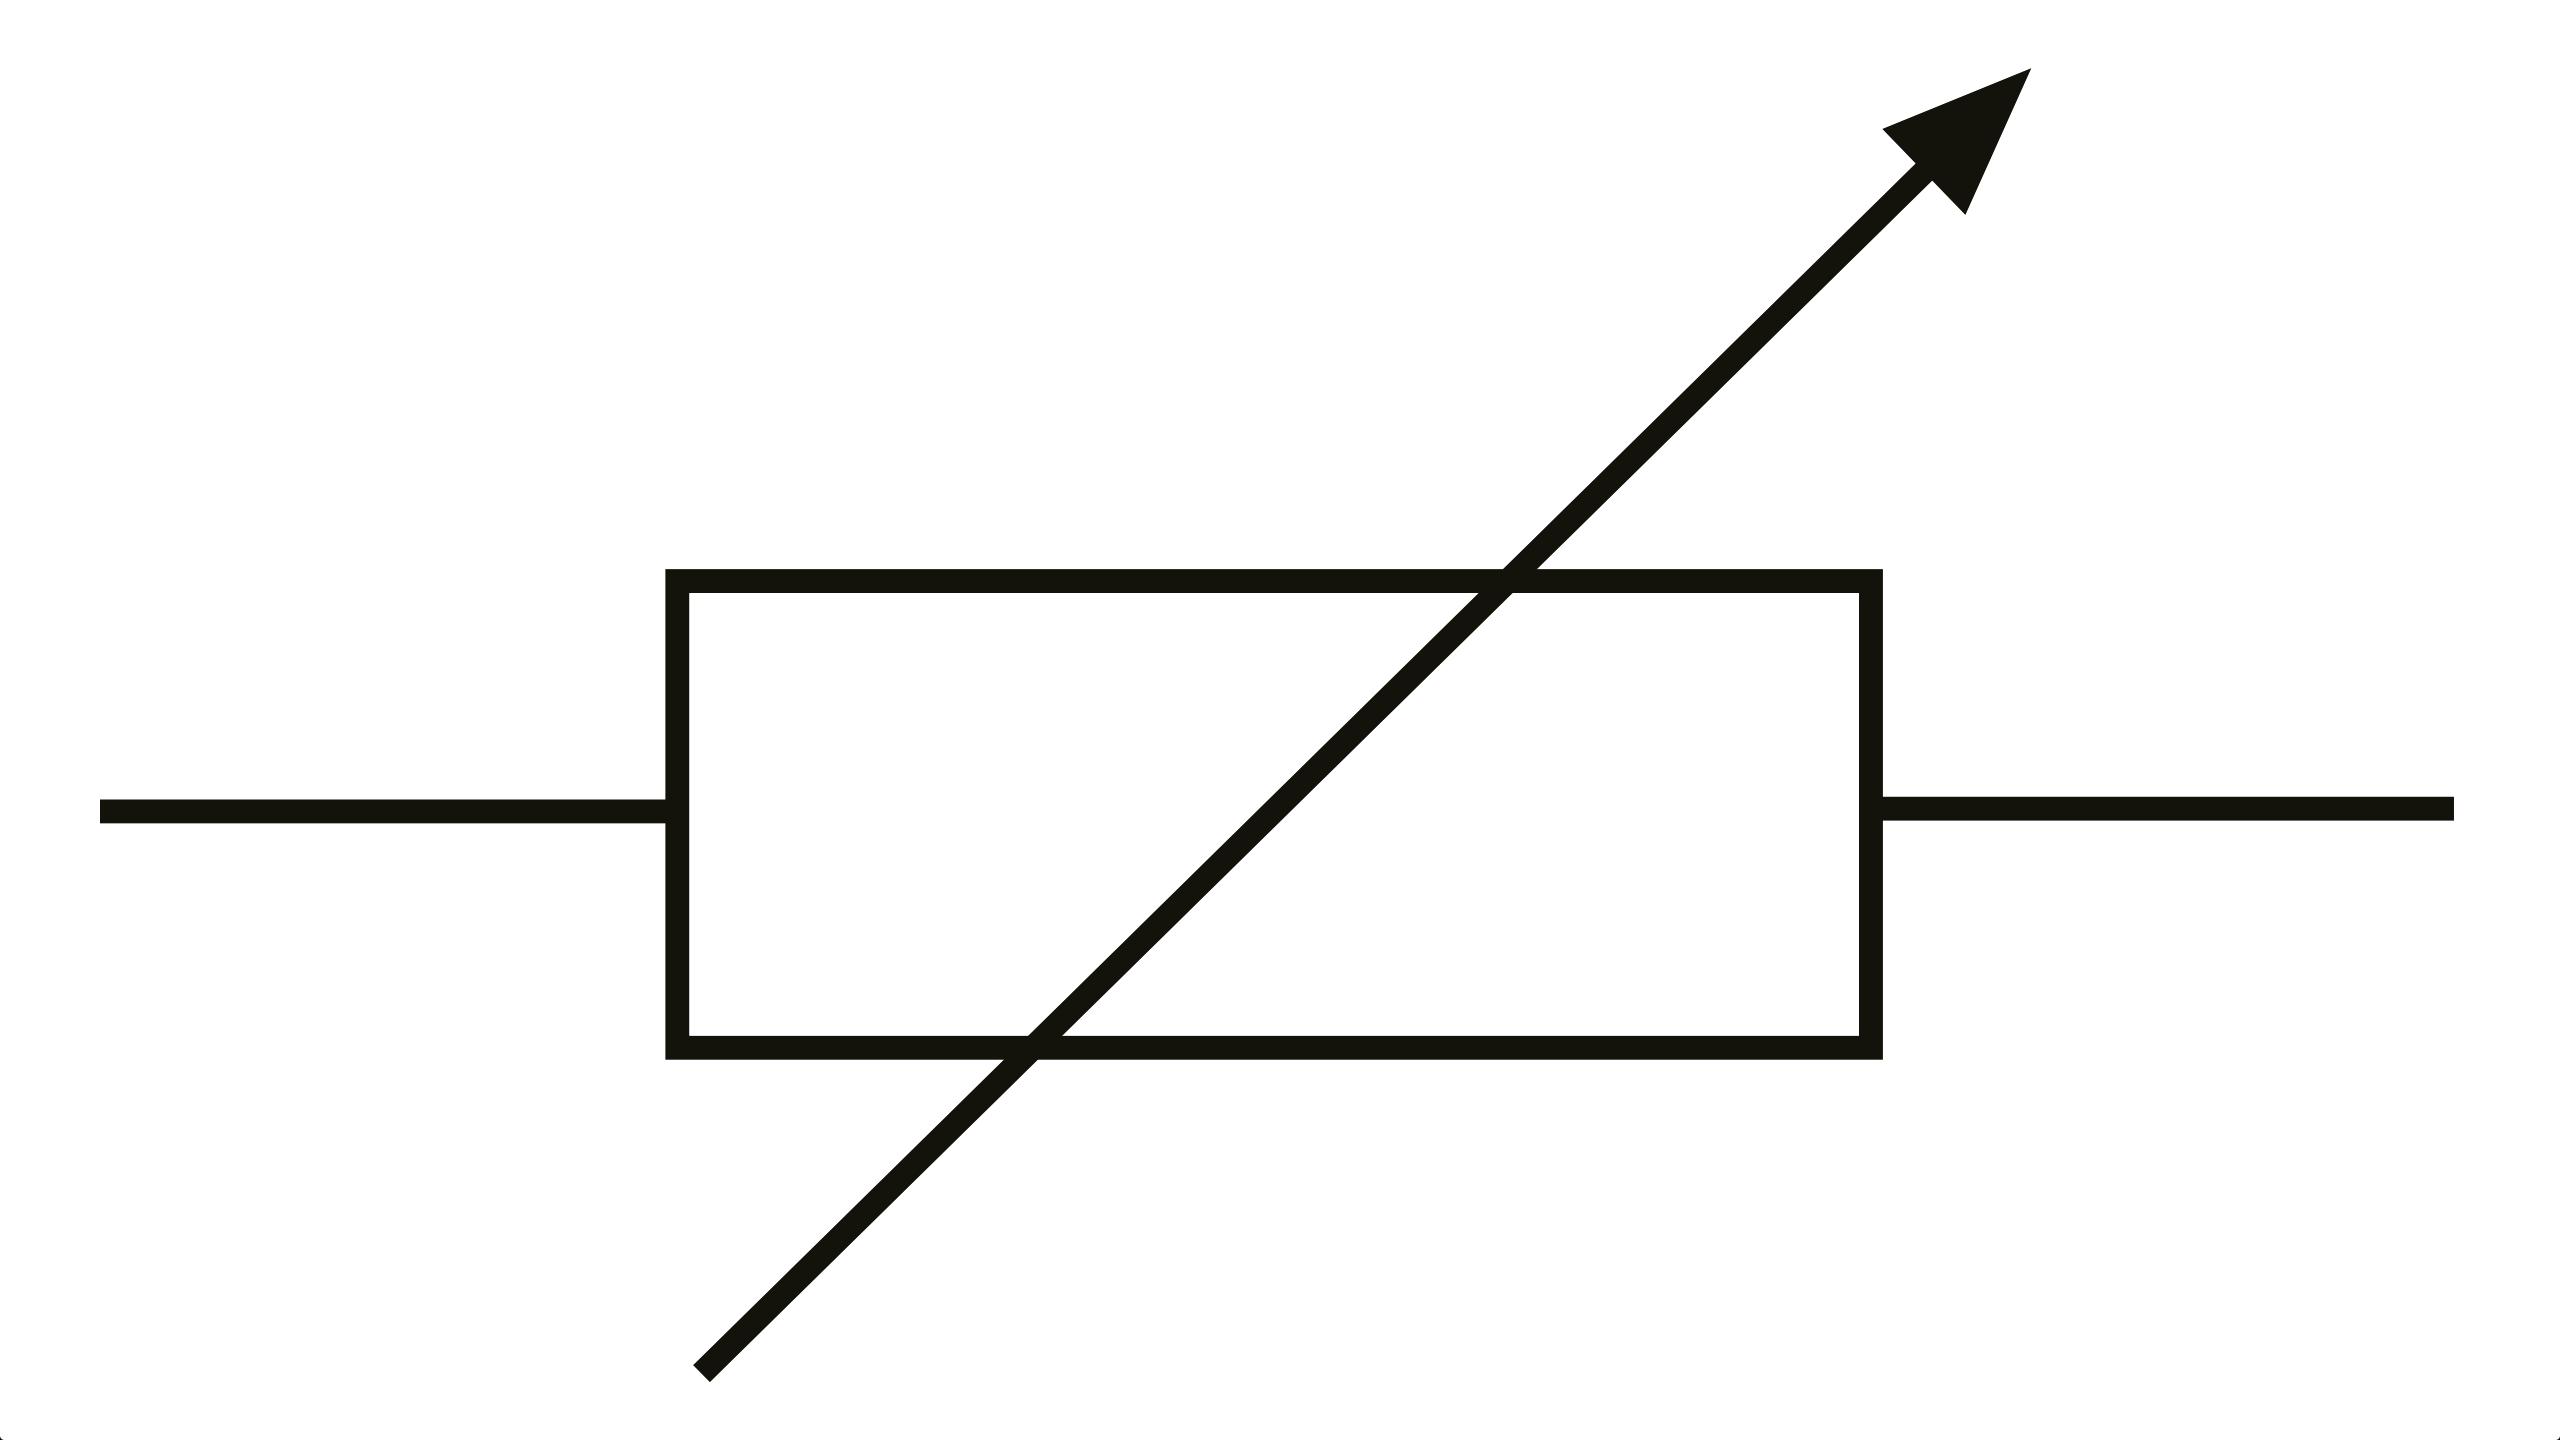 resistor diagram symbol clipart best